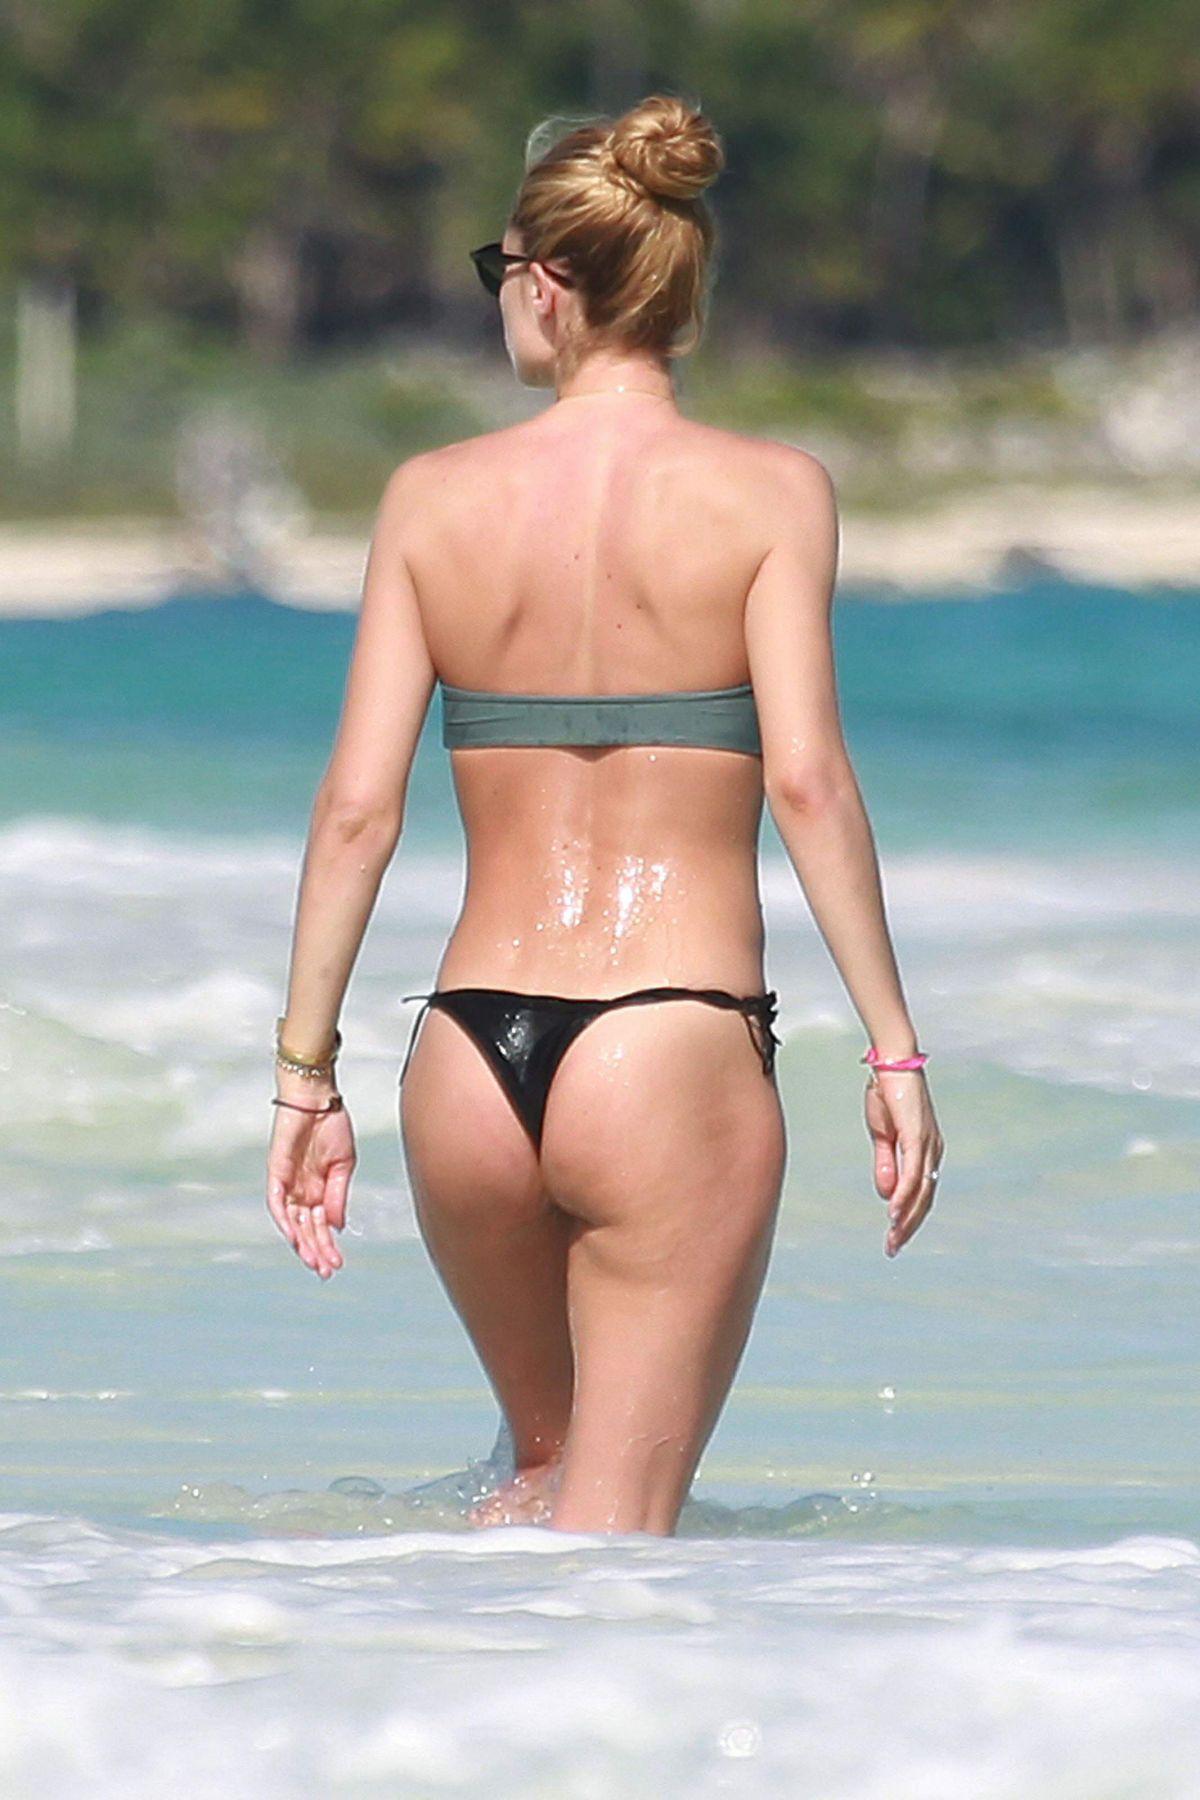 Bikini Doutzen Kroe nudes (52 foto and video), Sexy, Cleavage, Twitter, bra 2006